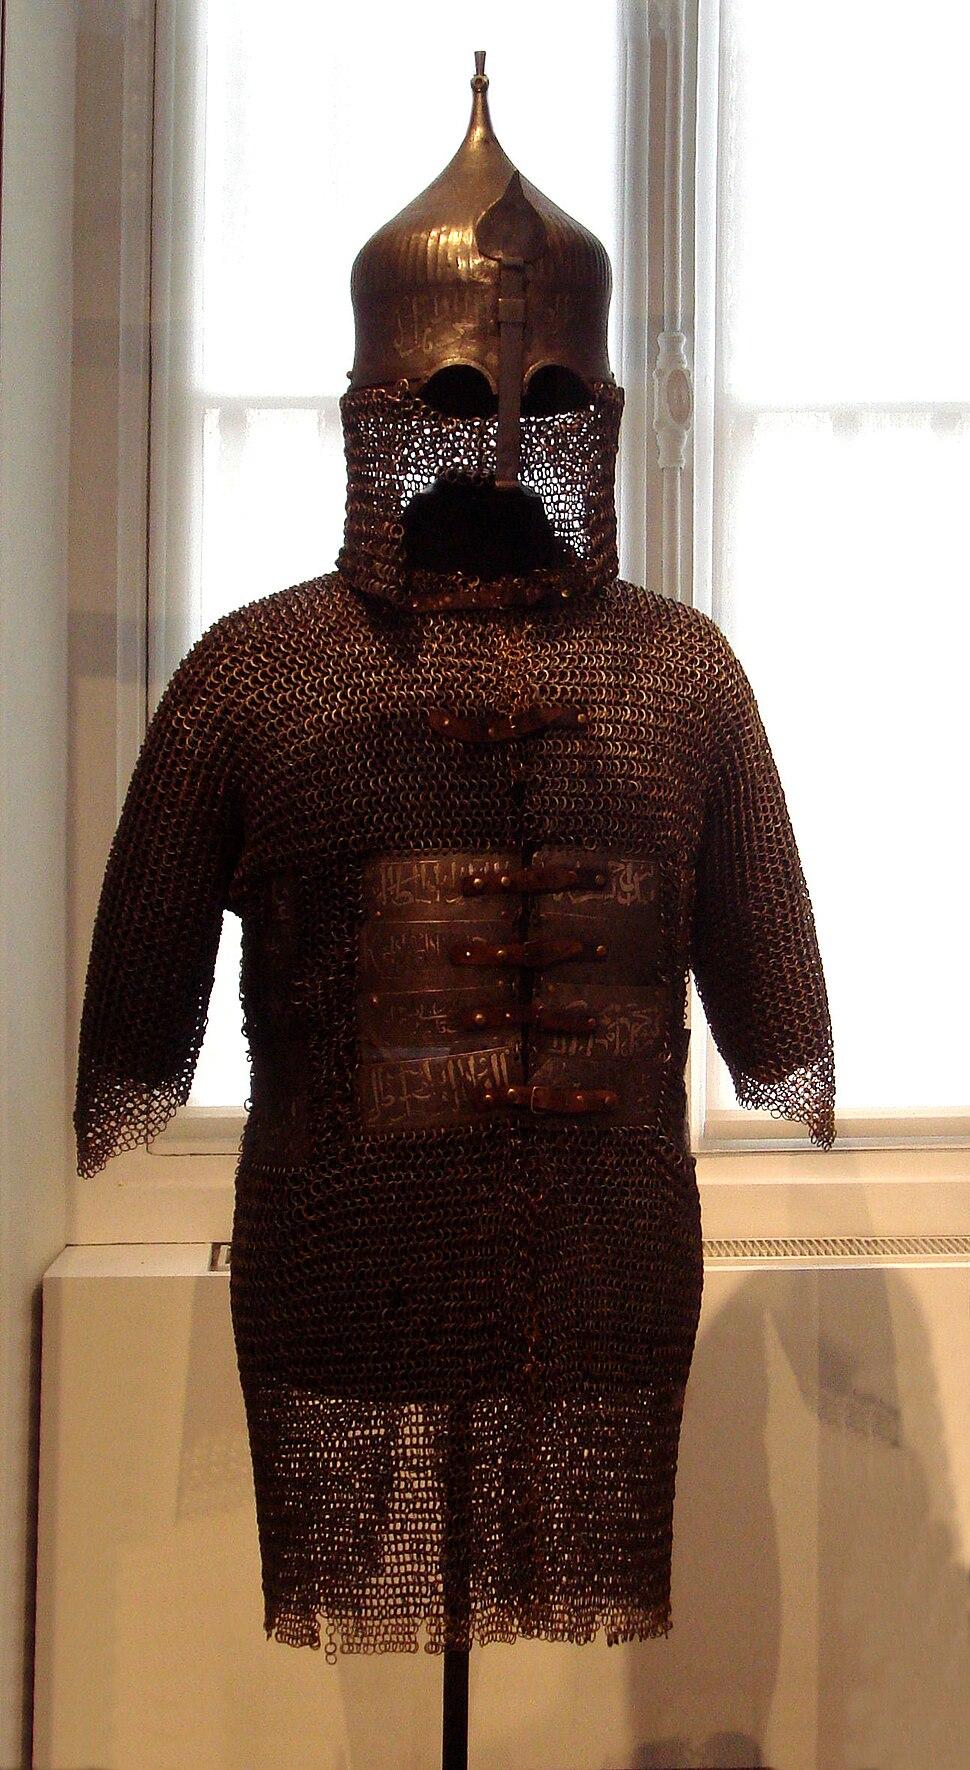 Ottoman armour 1480-1500